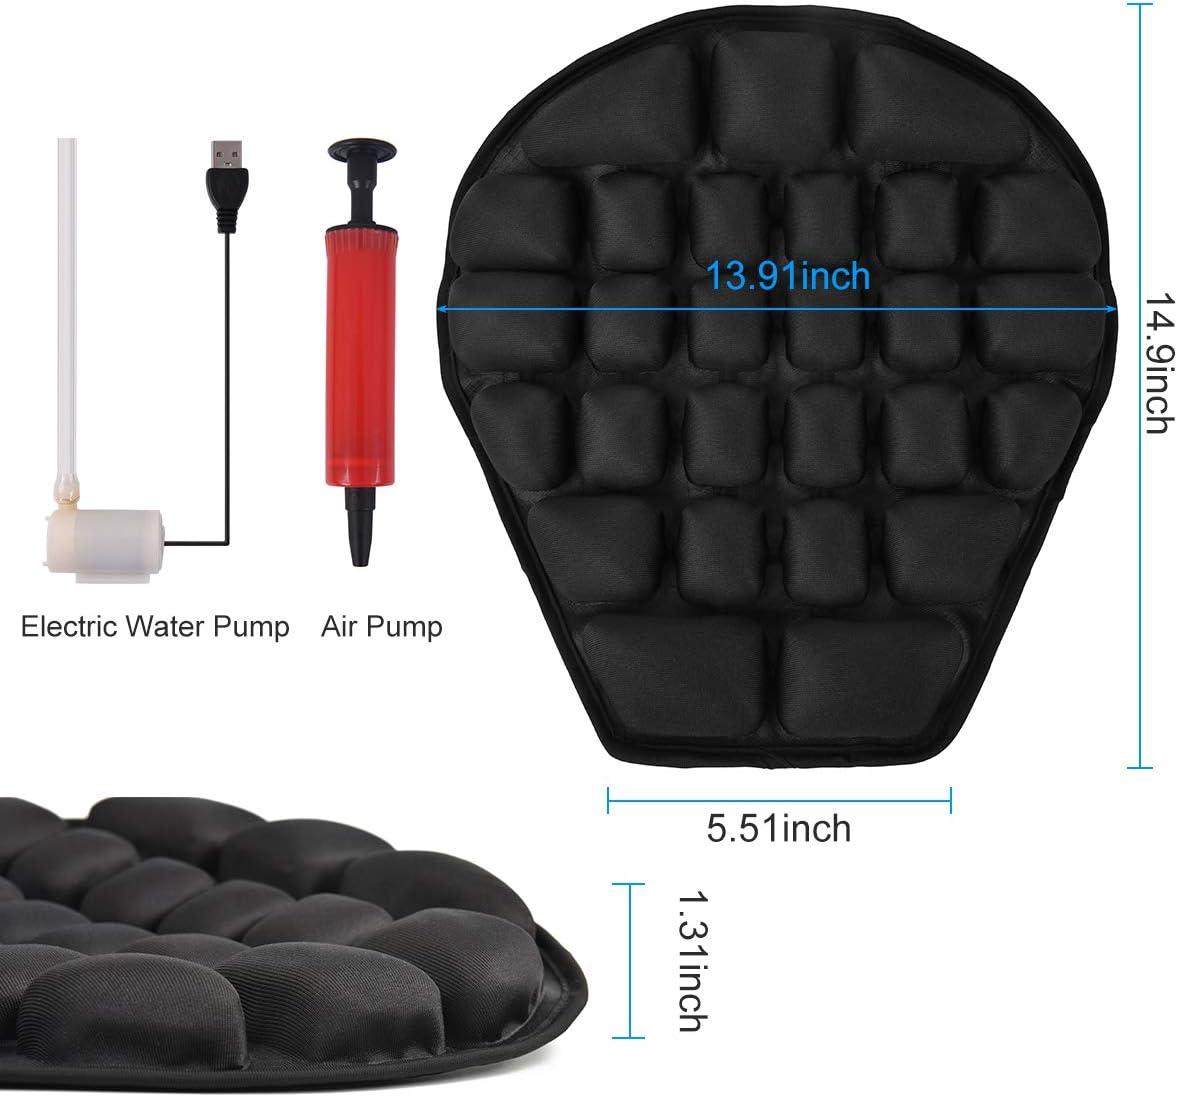 Heran Water Cooling Air Motorcycle Seat Cushion Pressure Relief Ride Seat Pad Large for Cruiser Touring Saddles